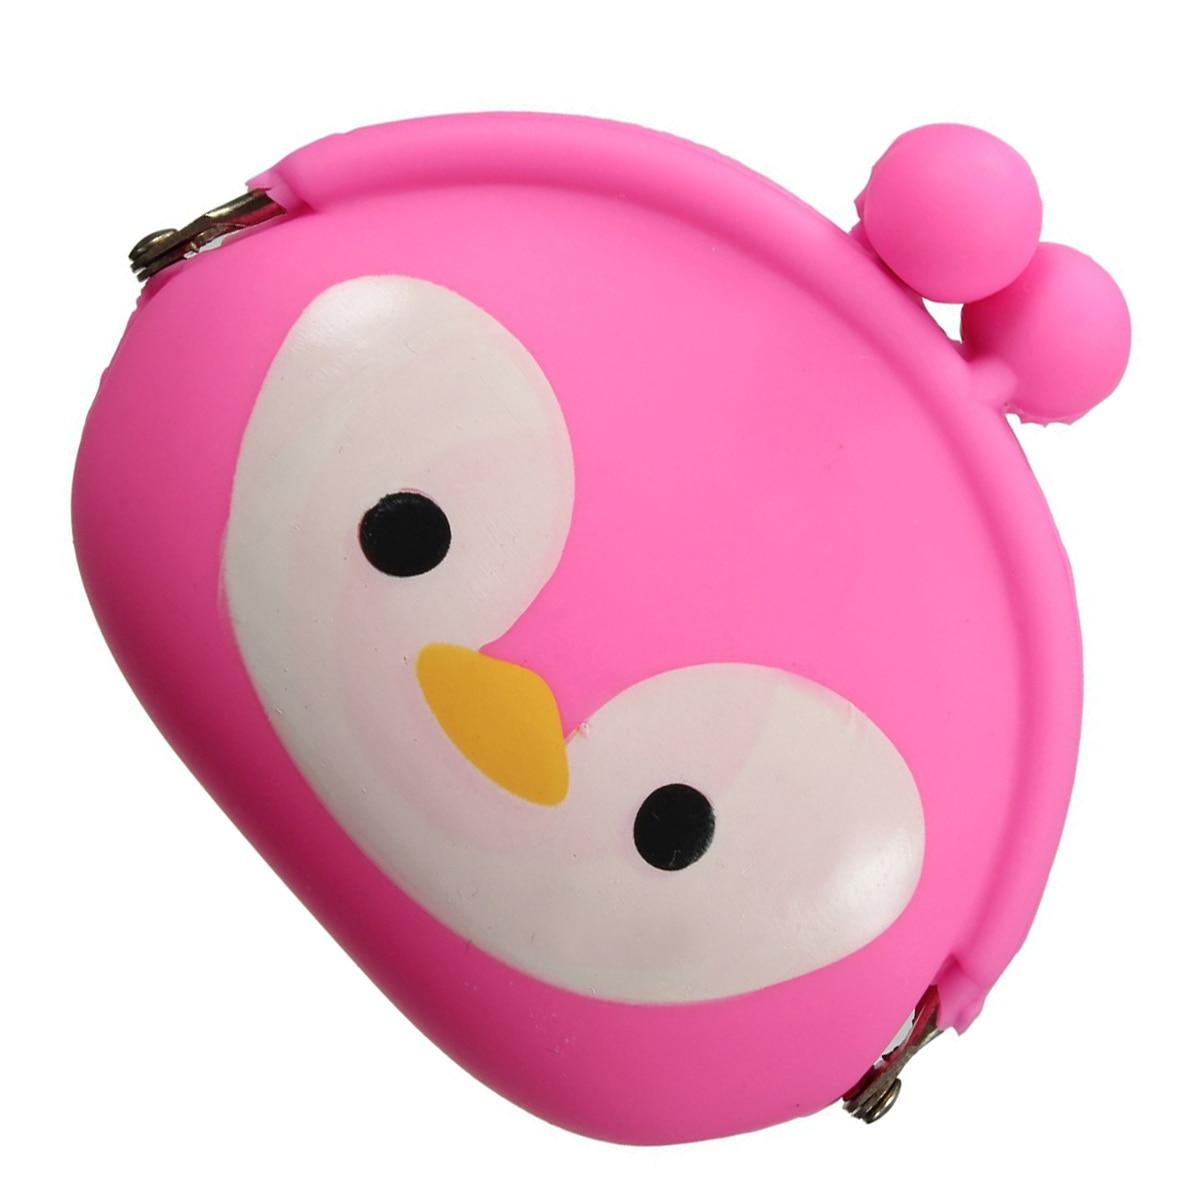 5pcs( ABDB-Women Girls Wallet Kawaii Cute Cartoon Animal Silicone Jelly Coin Bag Purse Kids Gift Penguin